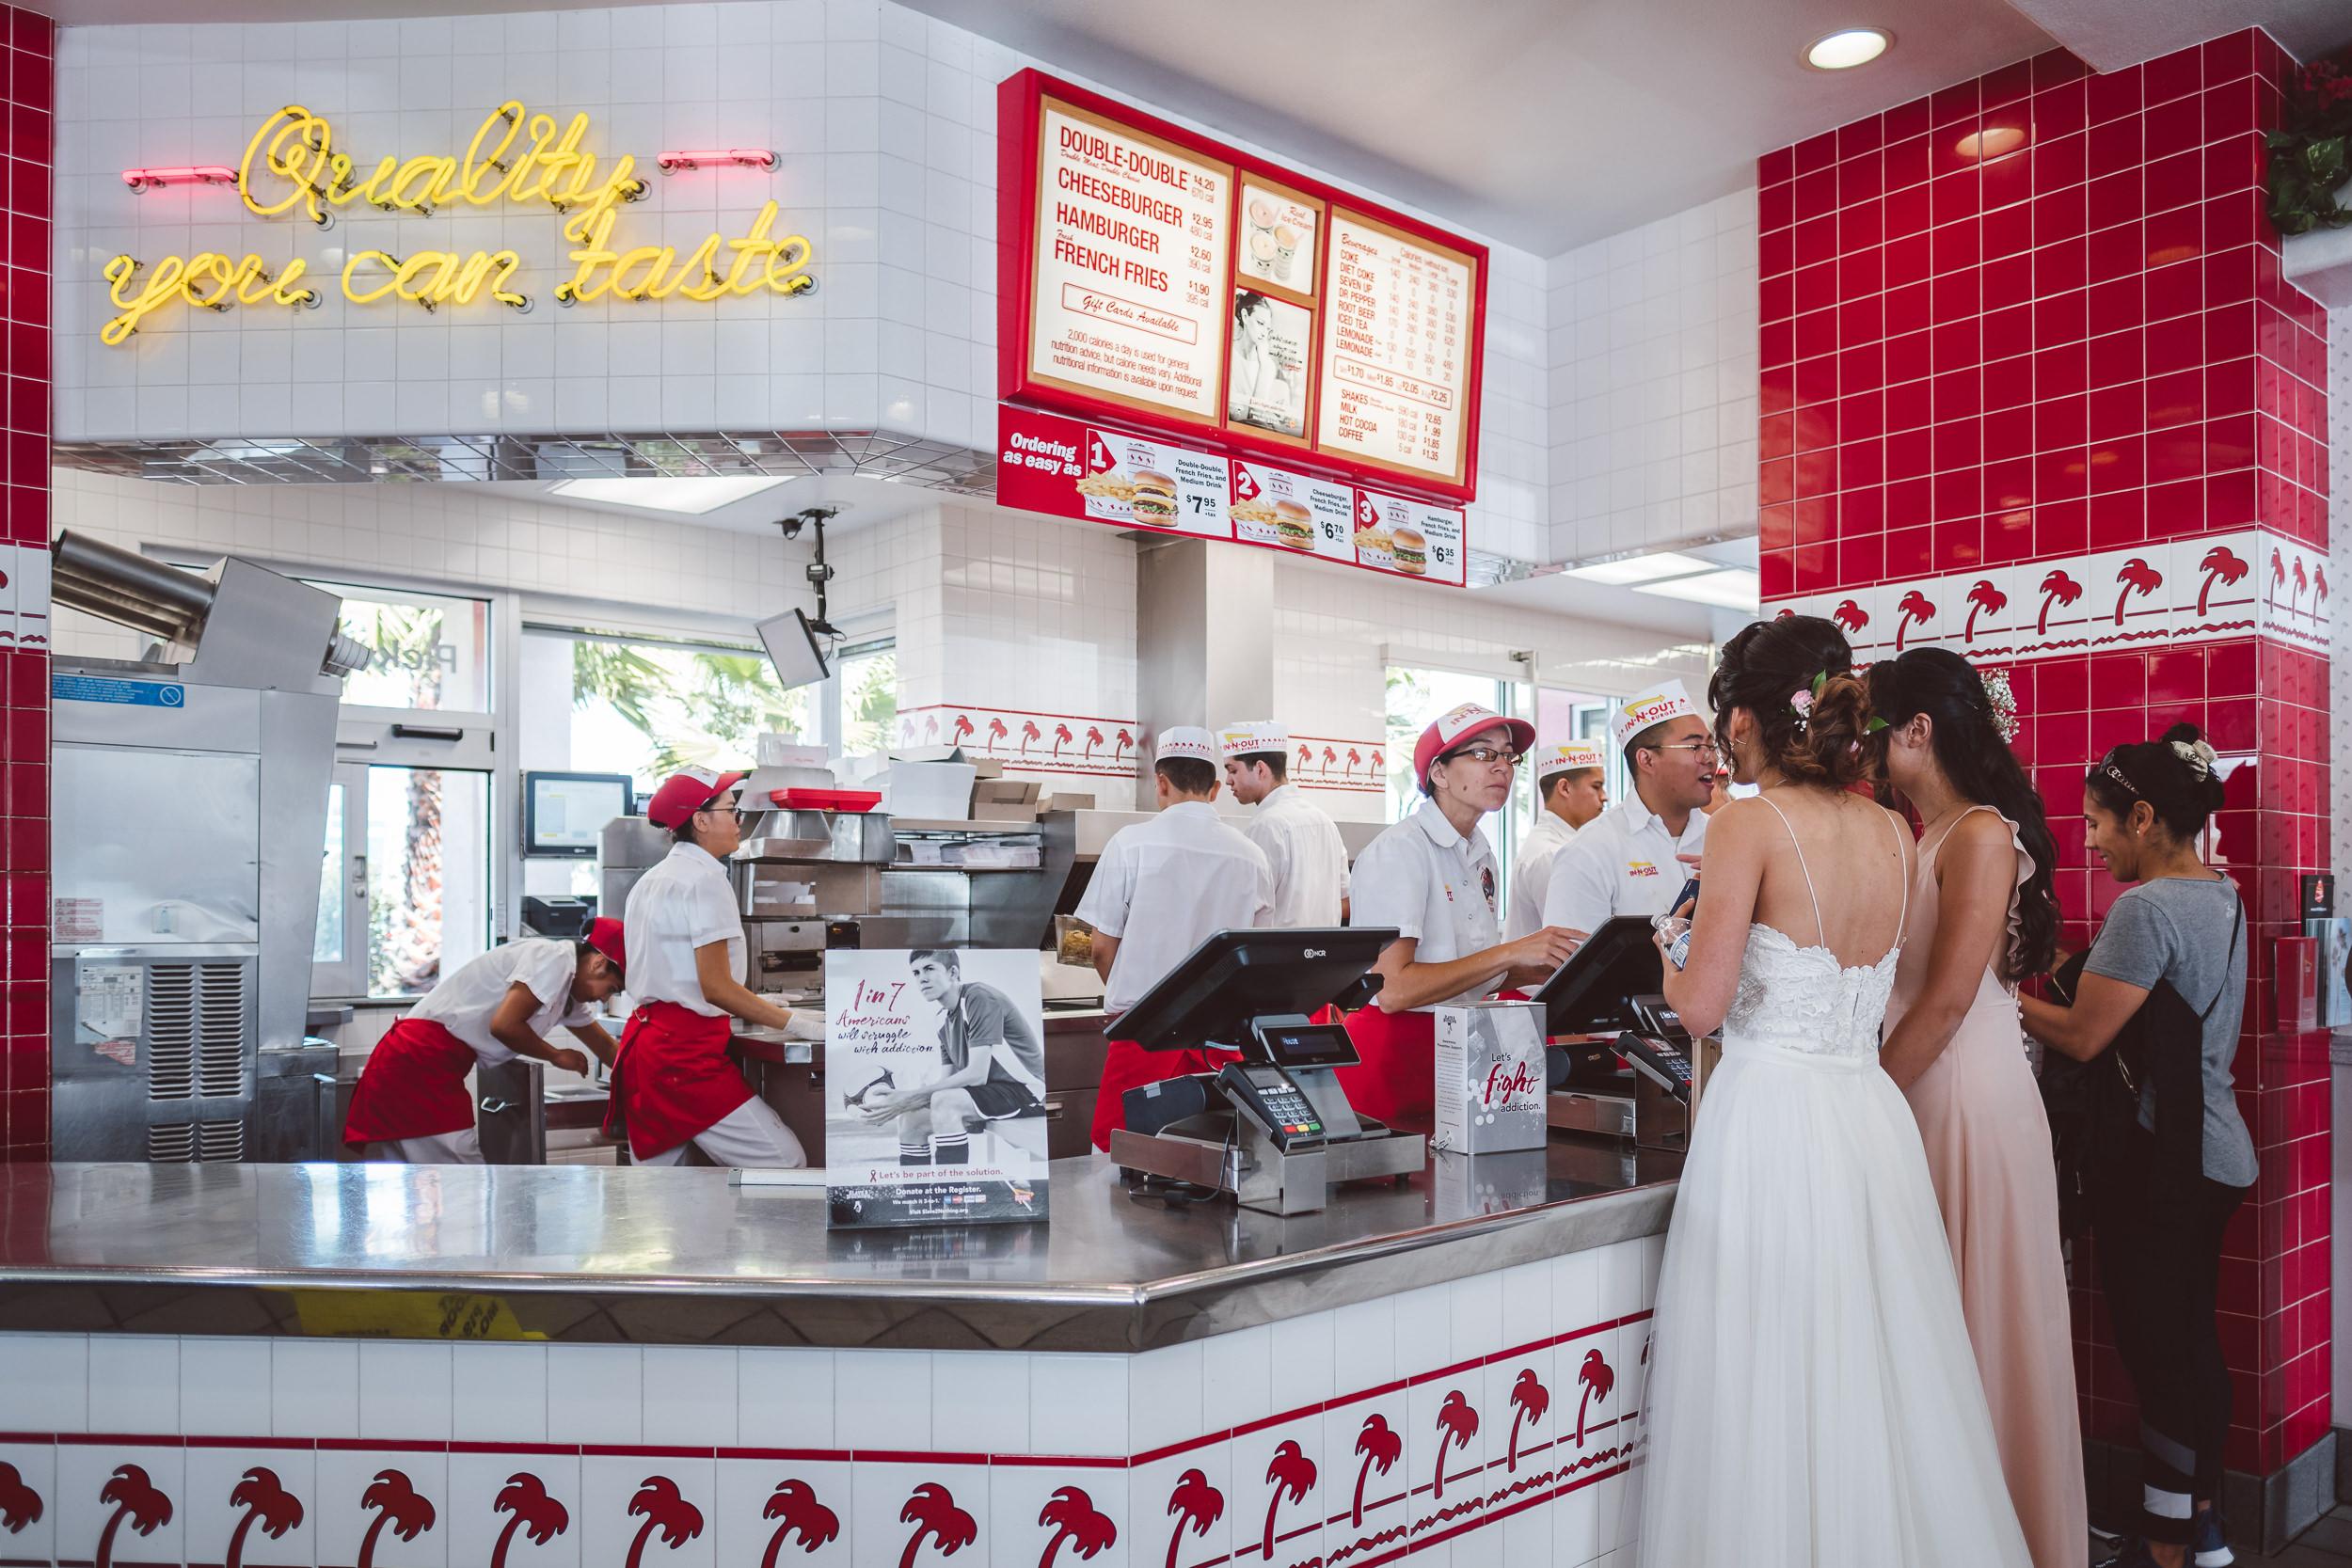 San-Francisco-City-Hall-Wedding-Photography-077.jpg